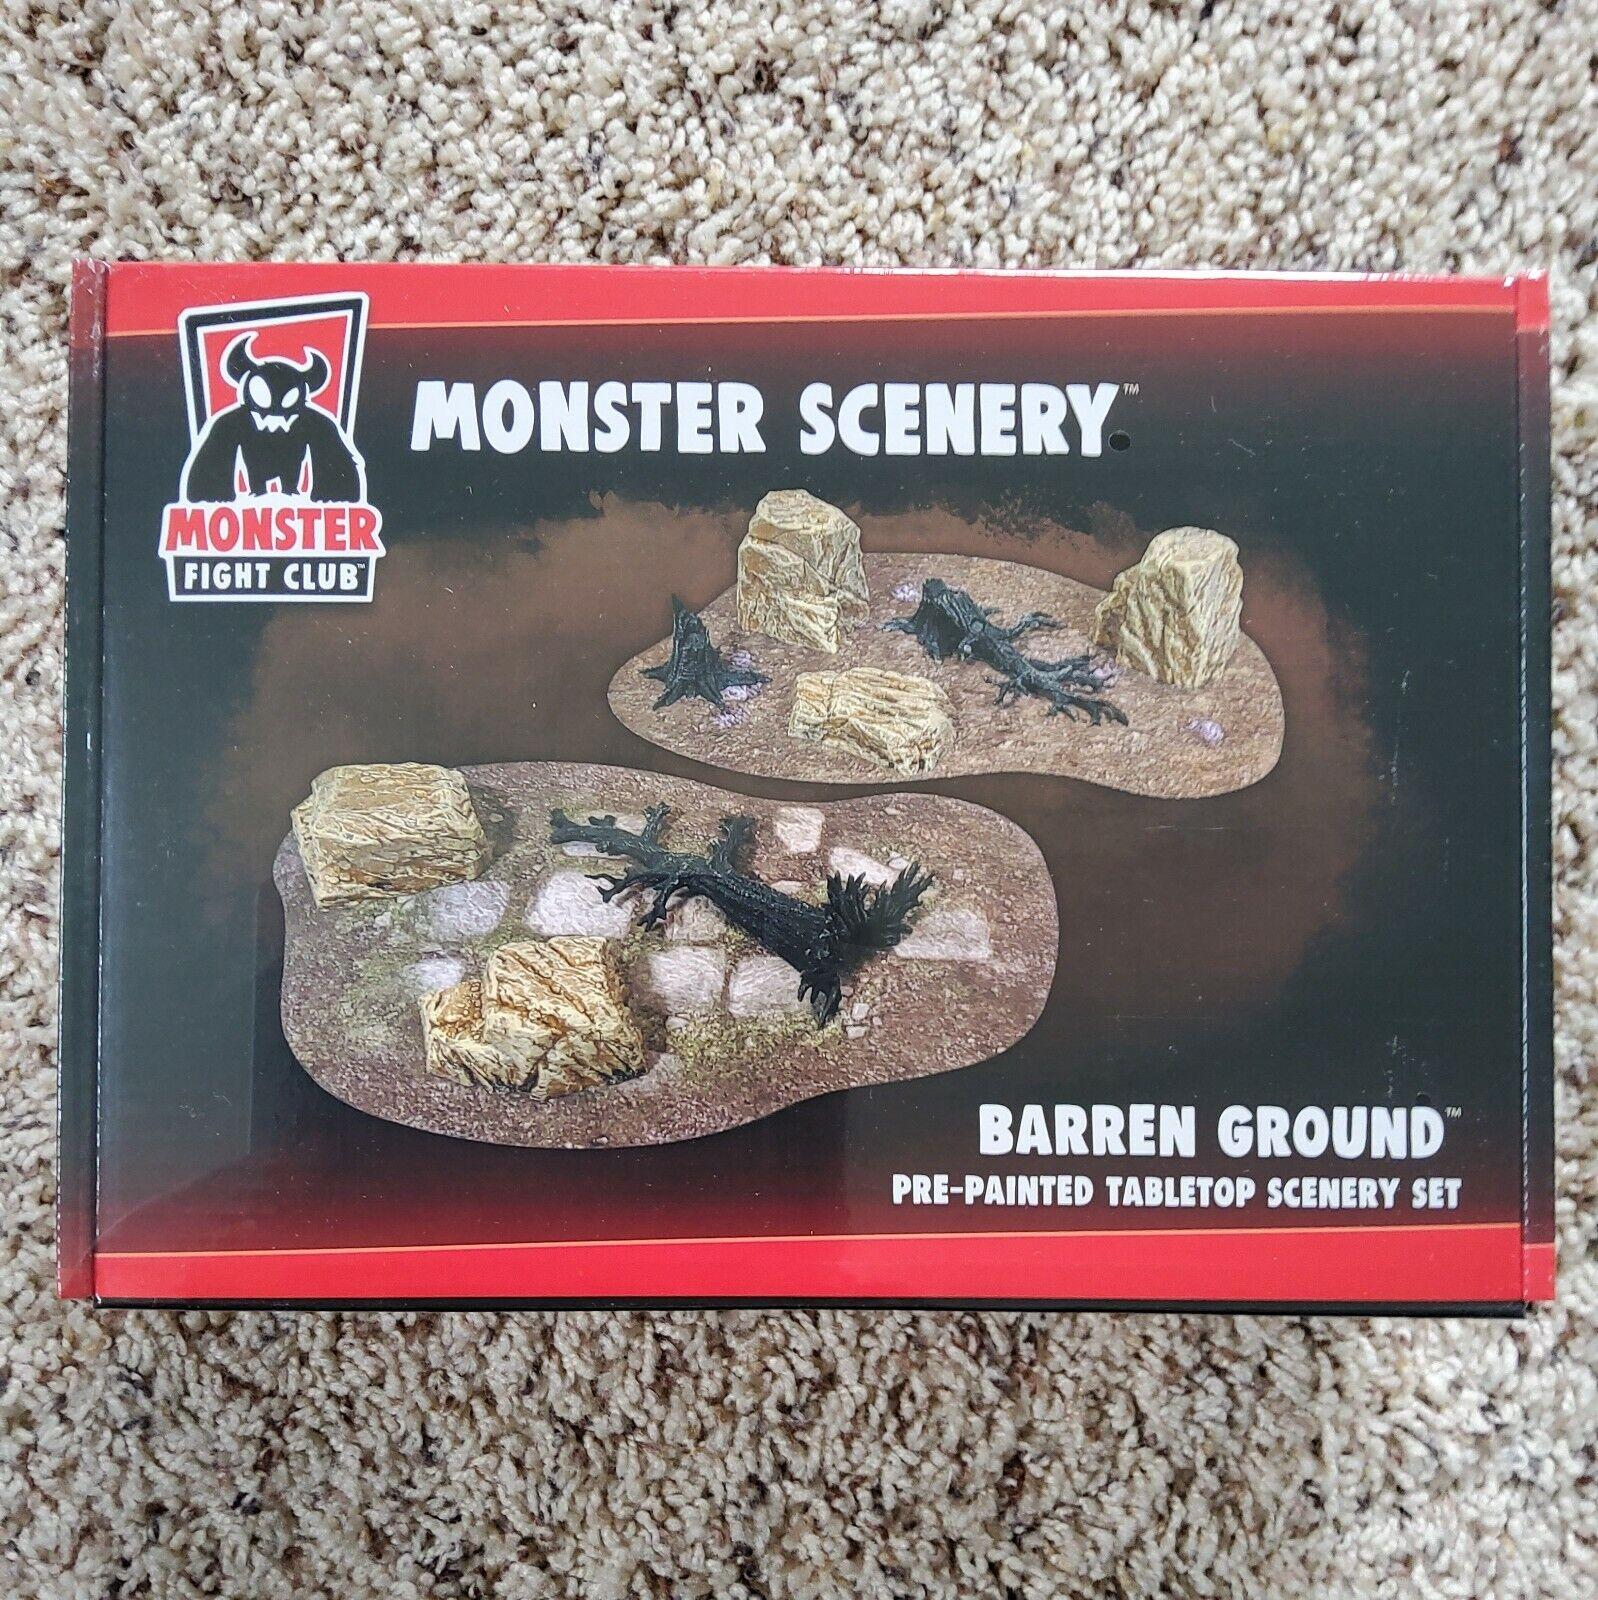 Monster Scenery - Barren Ground- Monster Fight Club - NEW UNOPENED